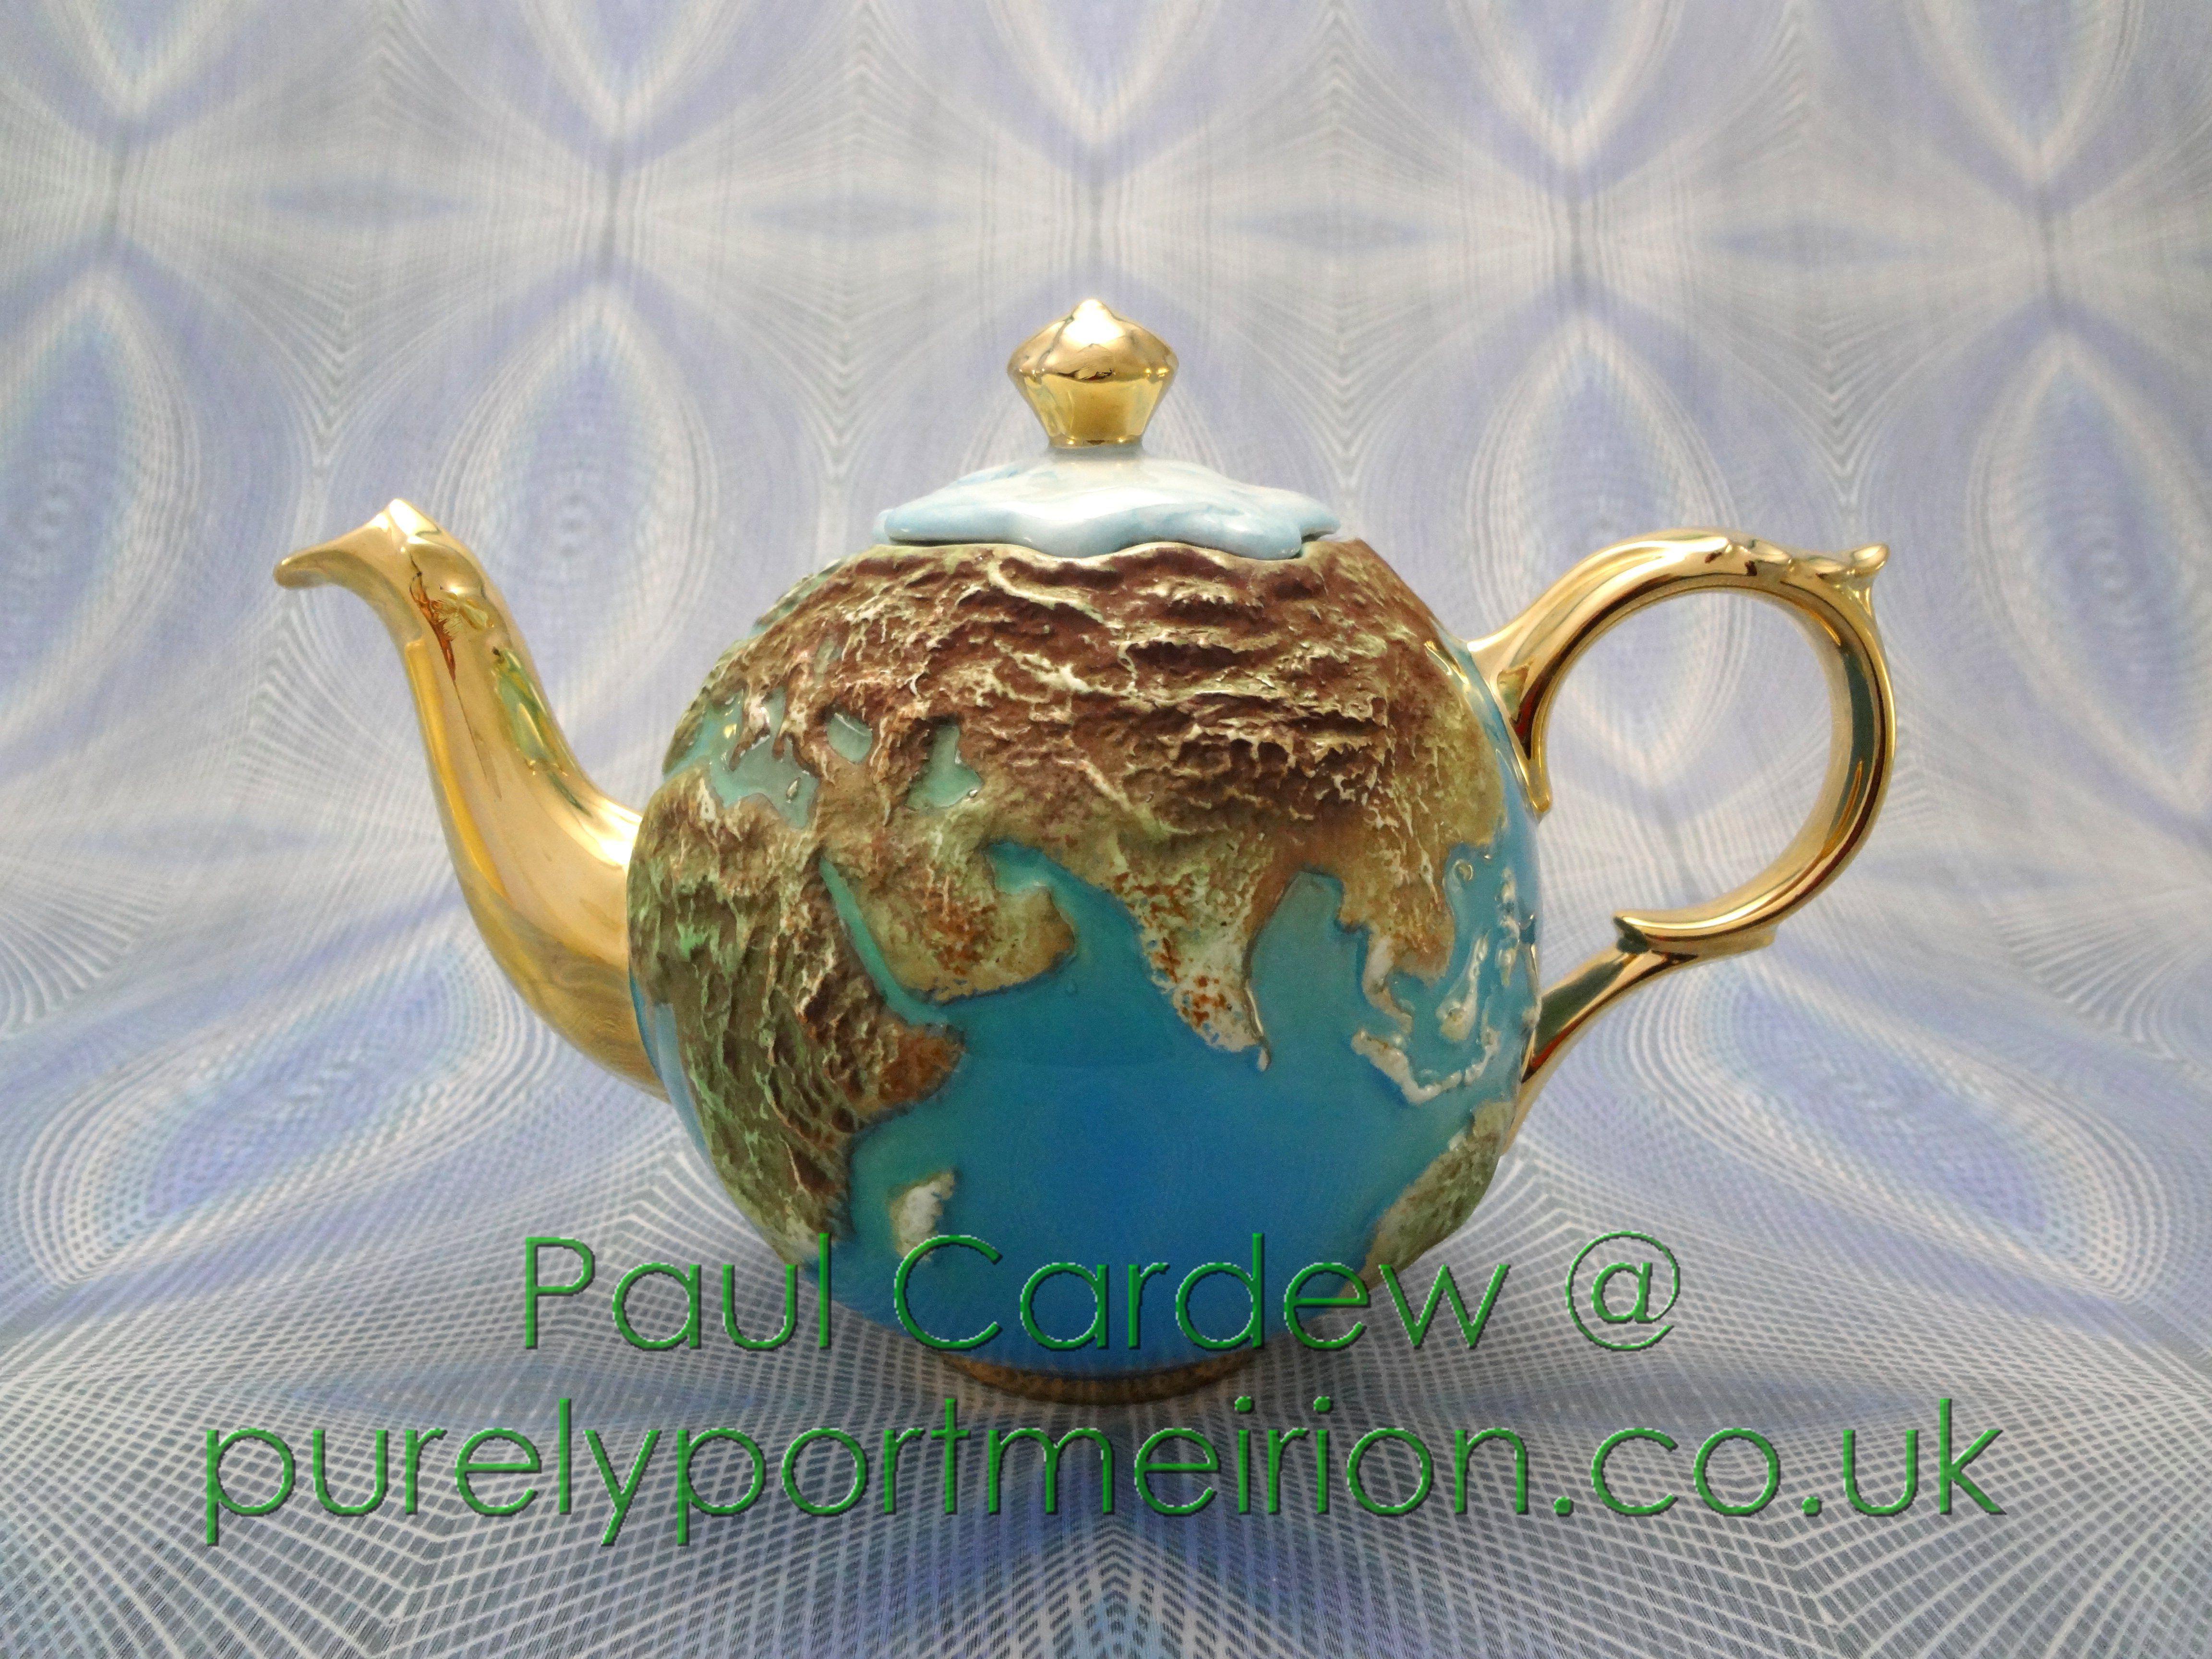 Paul Cardew Studio Design Eterni Tea